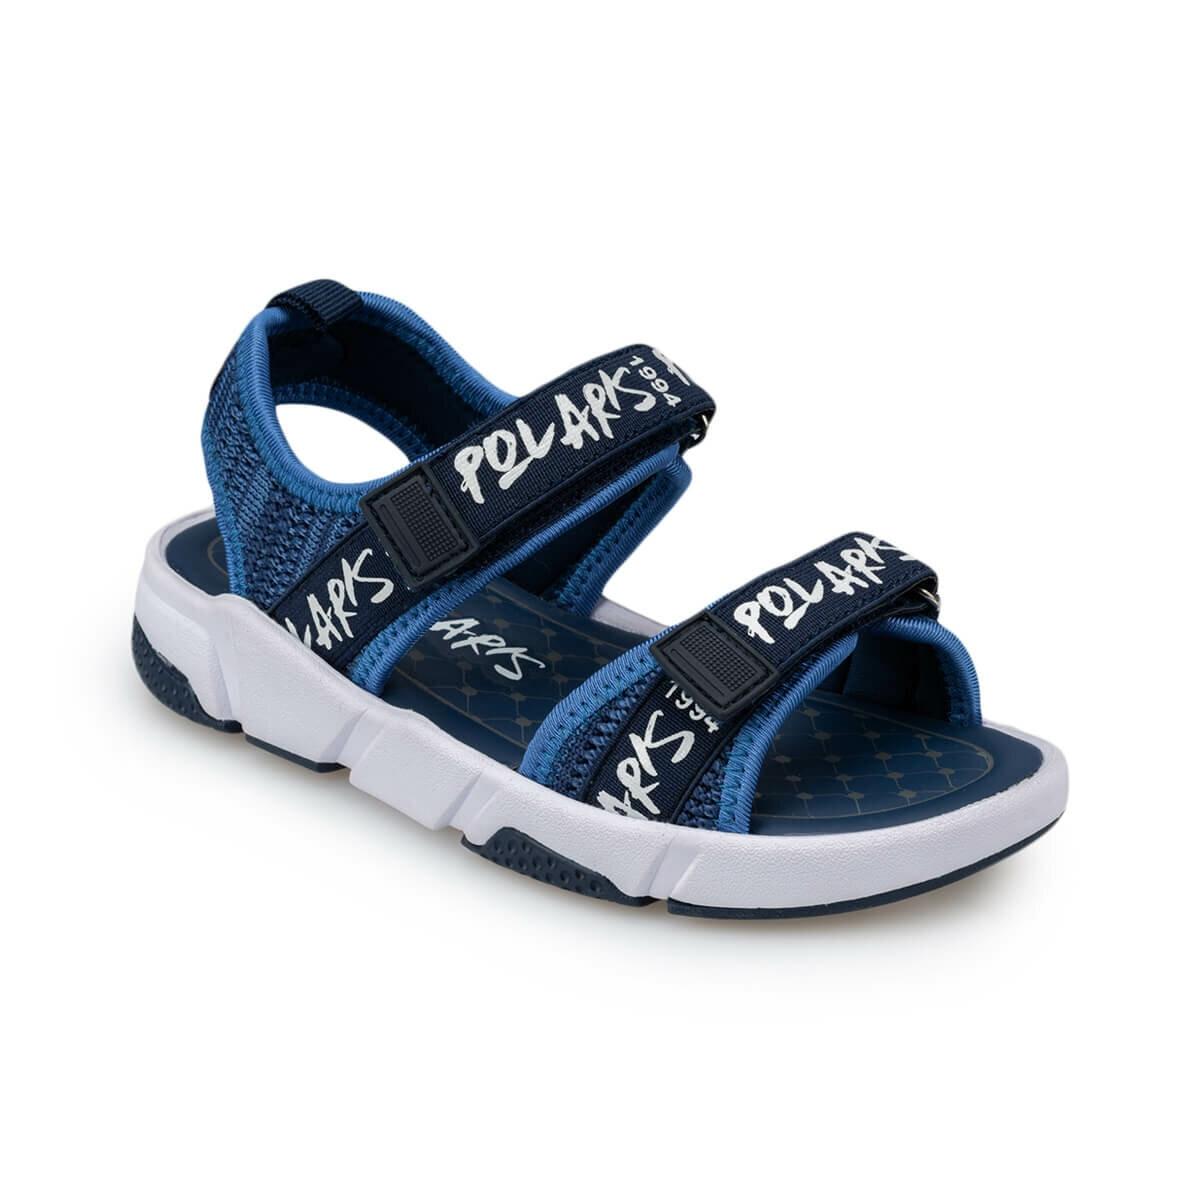 FLO 91.511307.F Navy Blue Male Child Sports Shoes Polaris